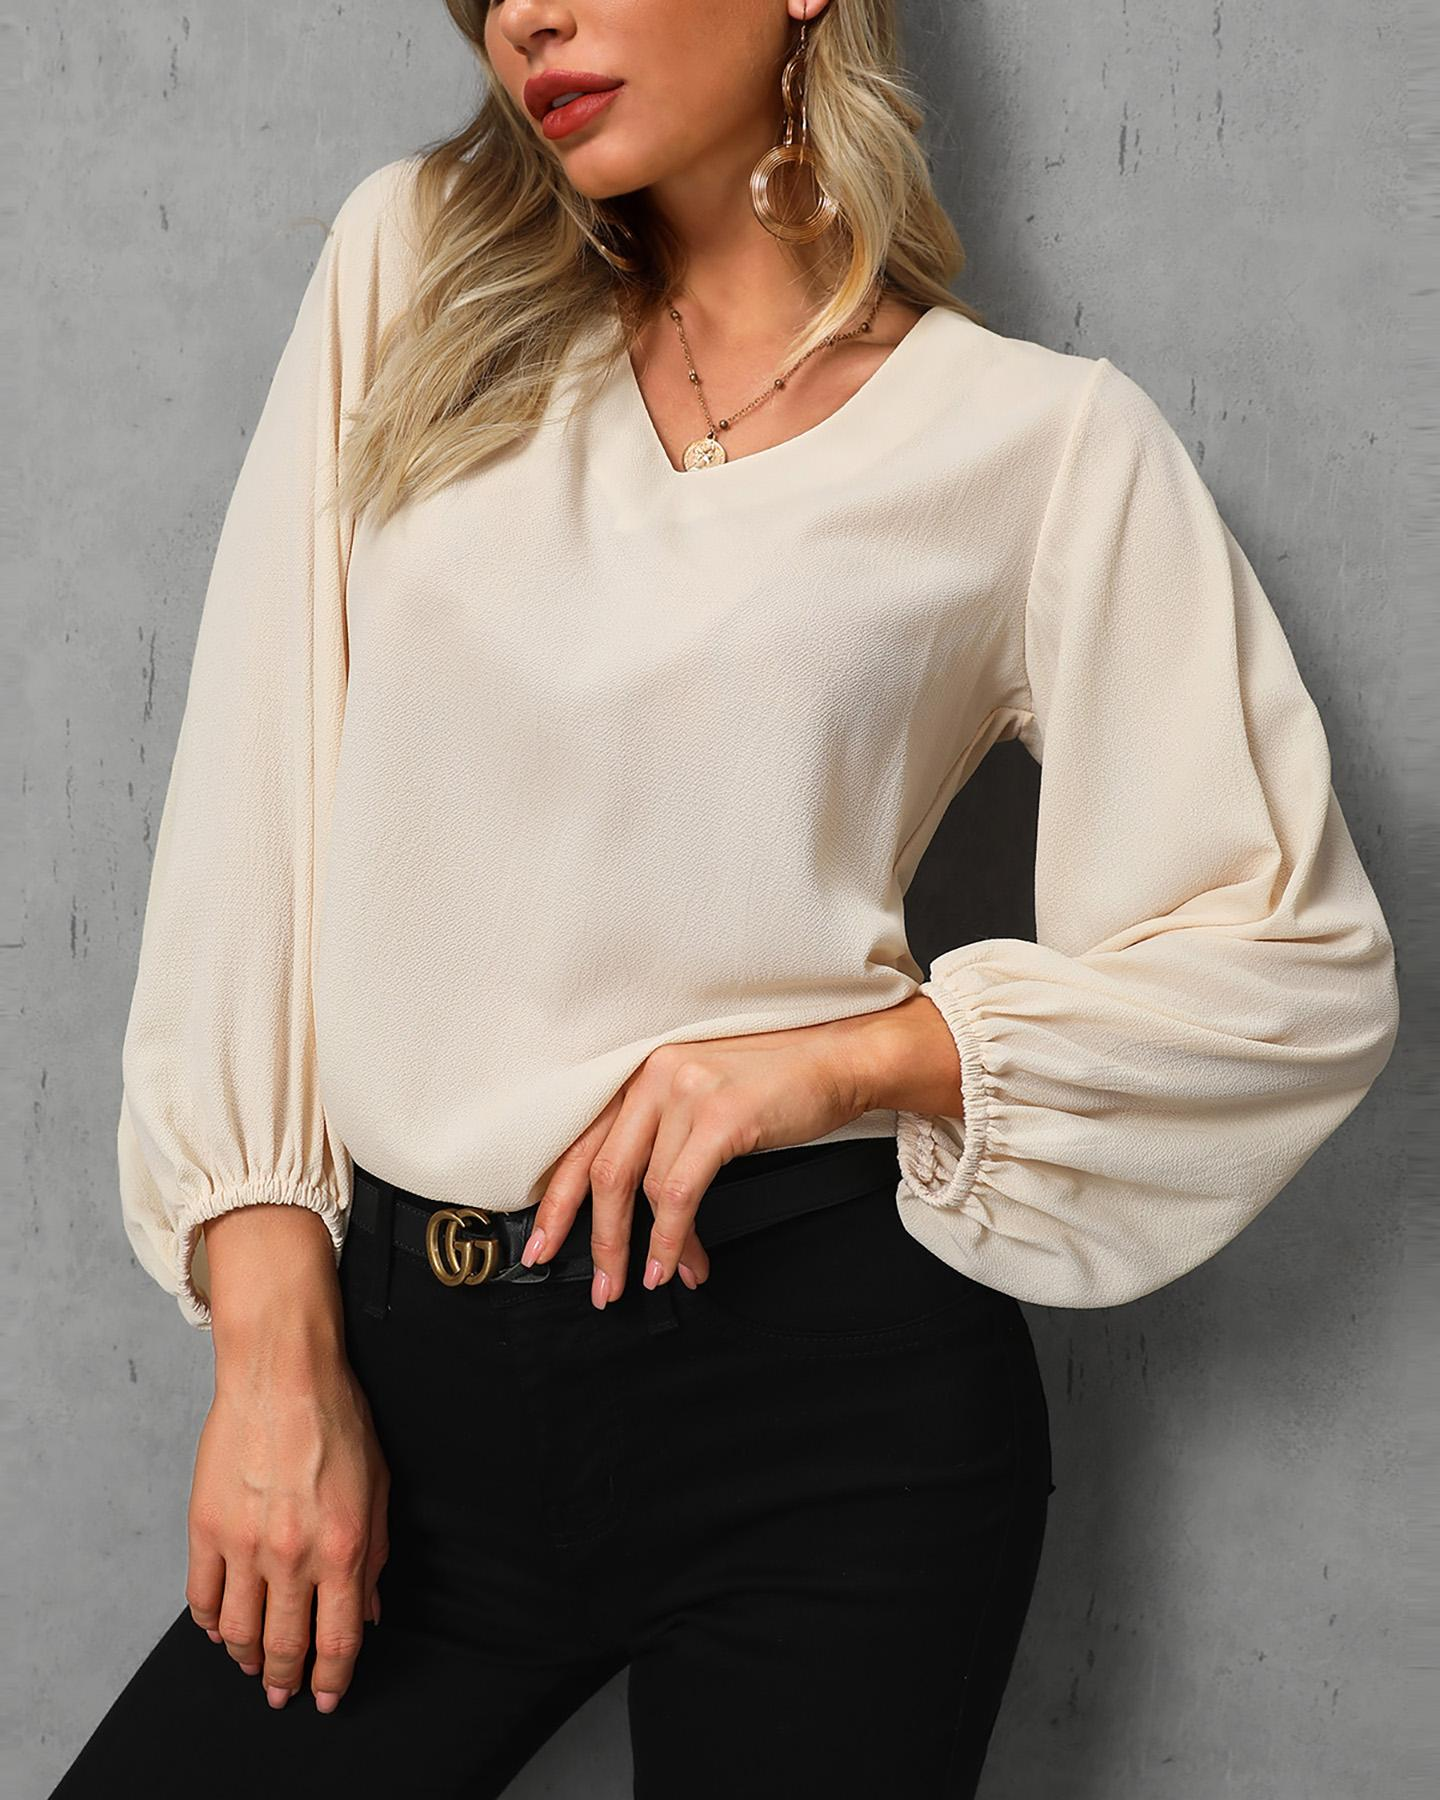 chicme / Blusa suelta de manga larga con cuello en V